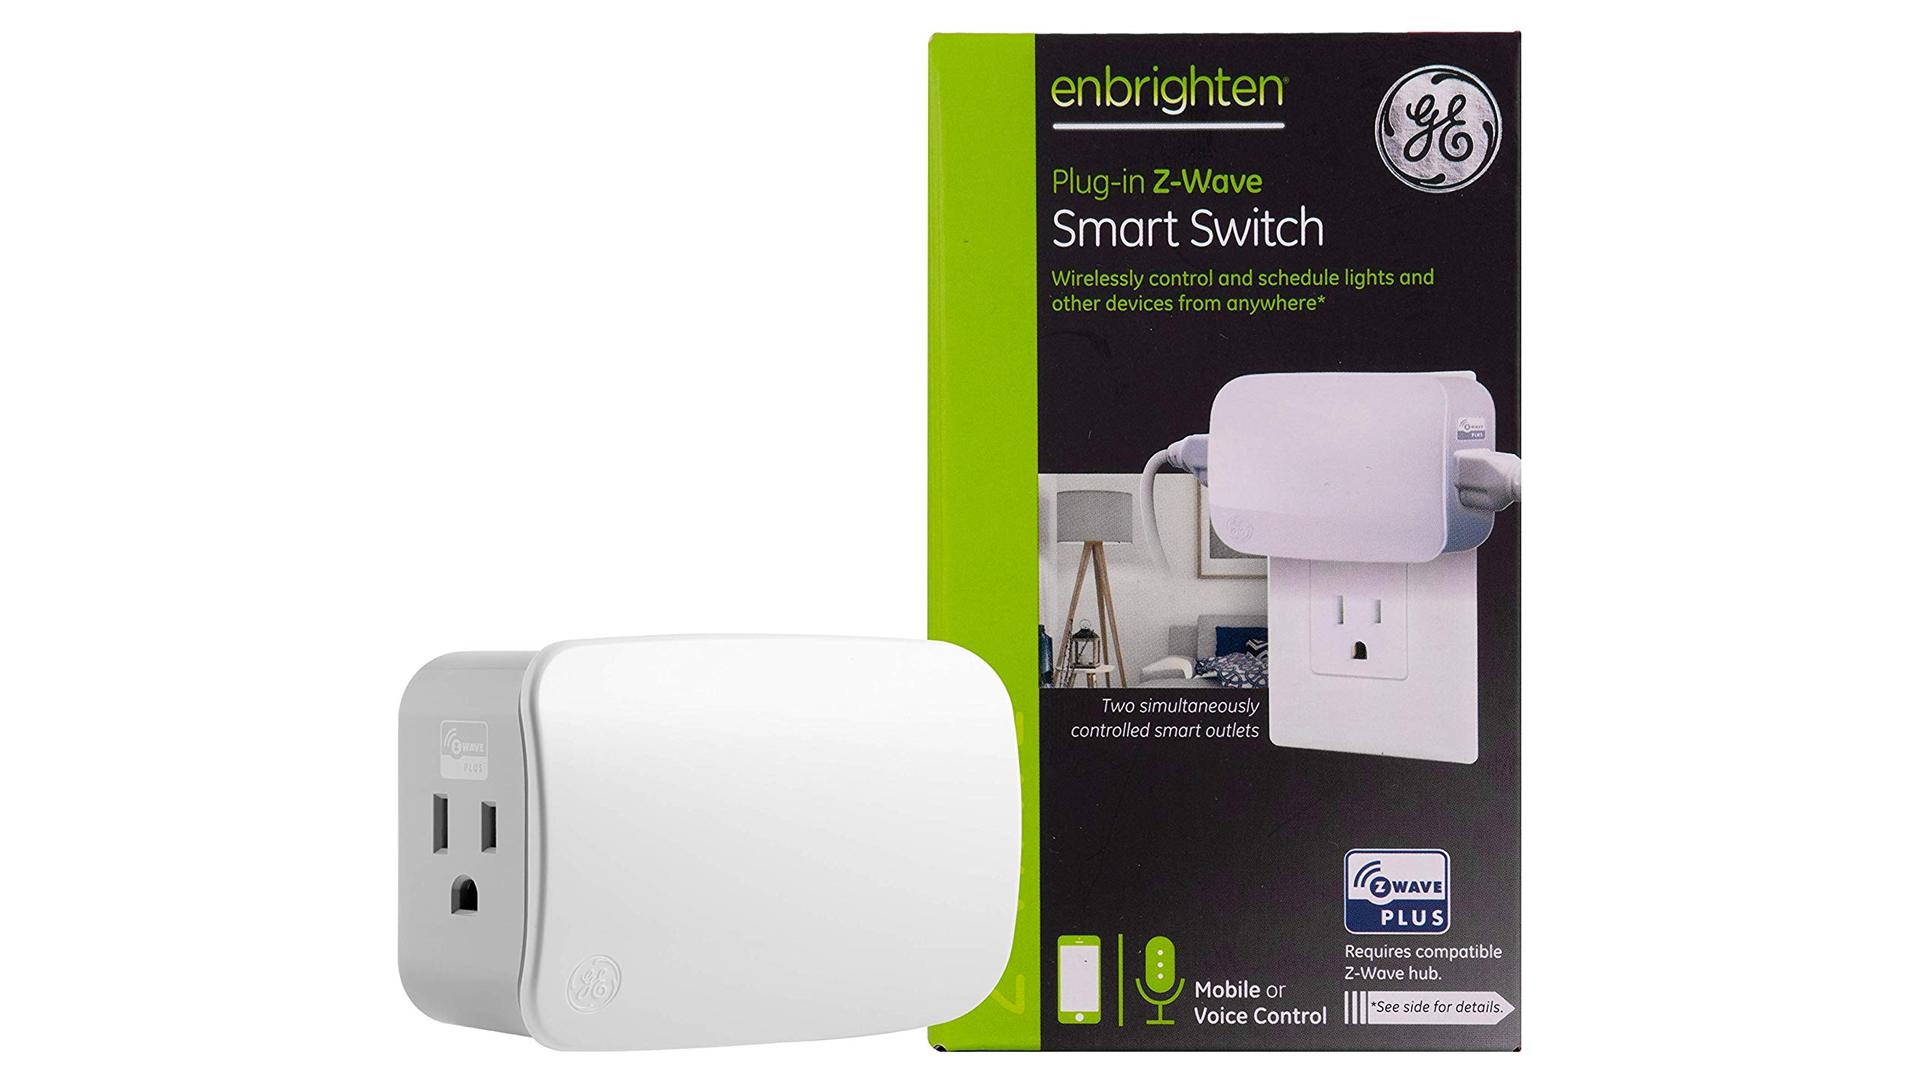 The GE Enbrighten smart switch